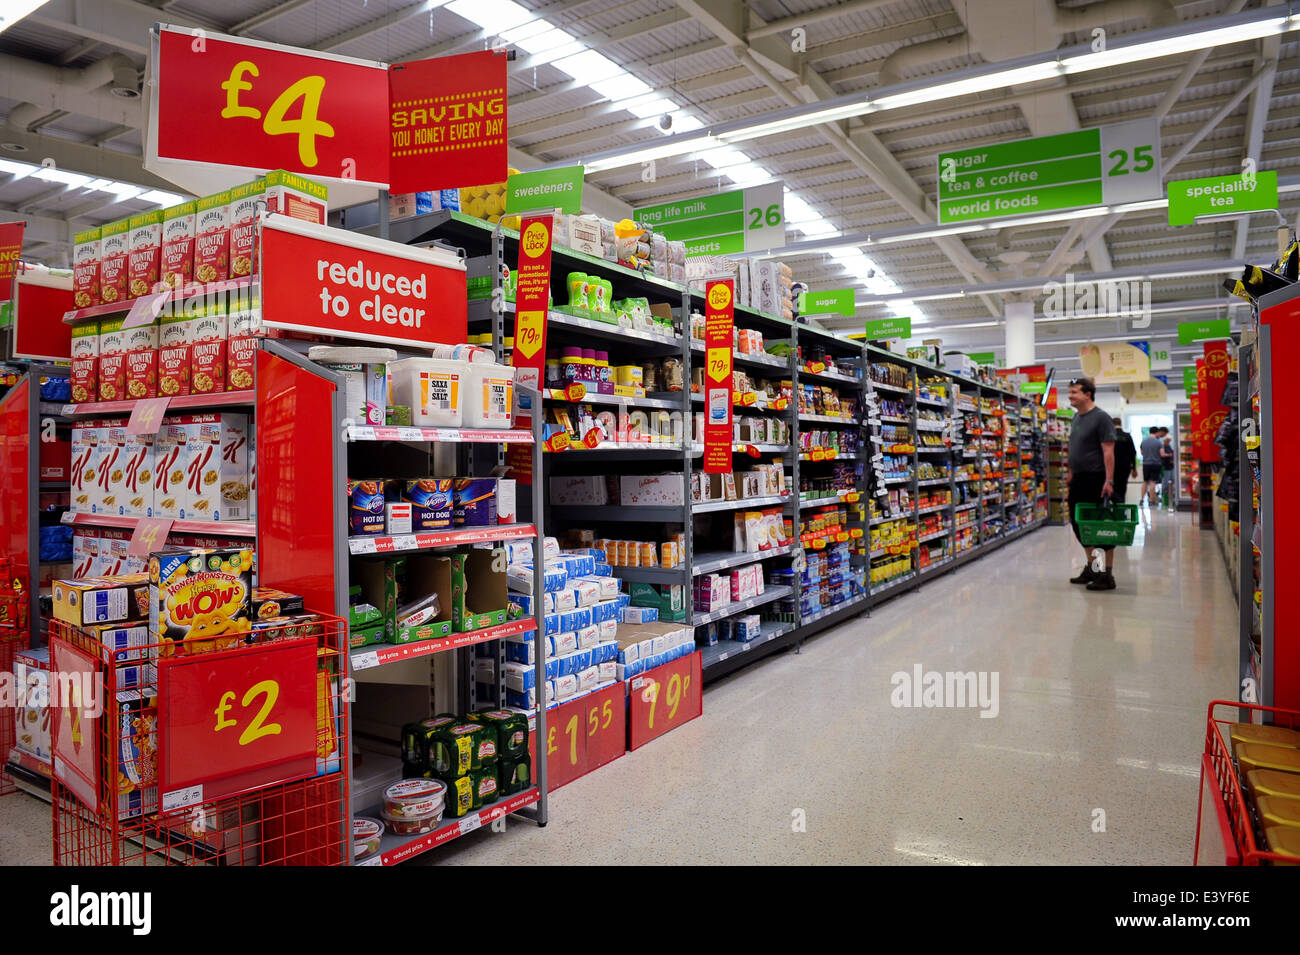 asda supermarket interior 2014 - Stock Image